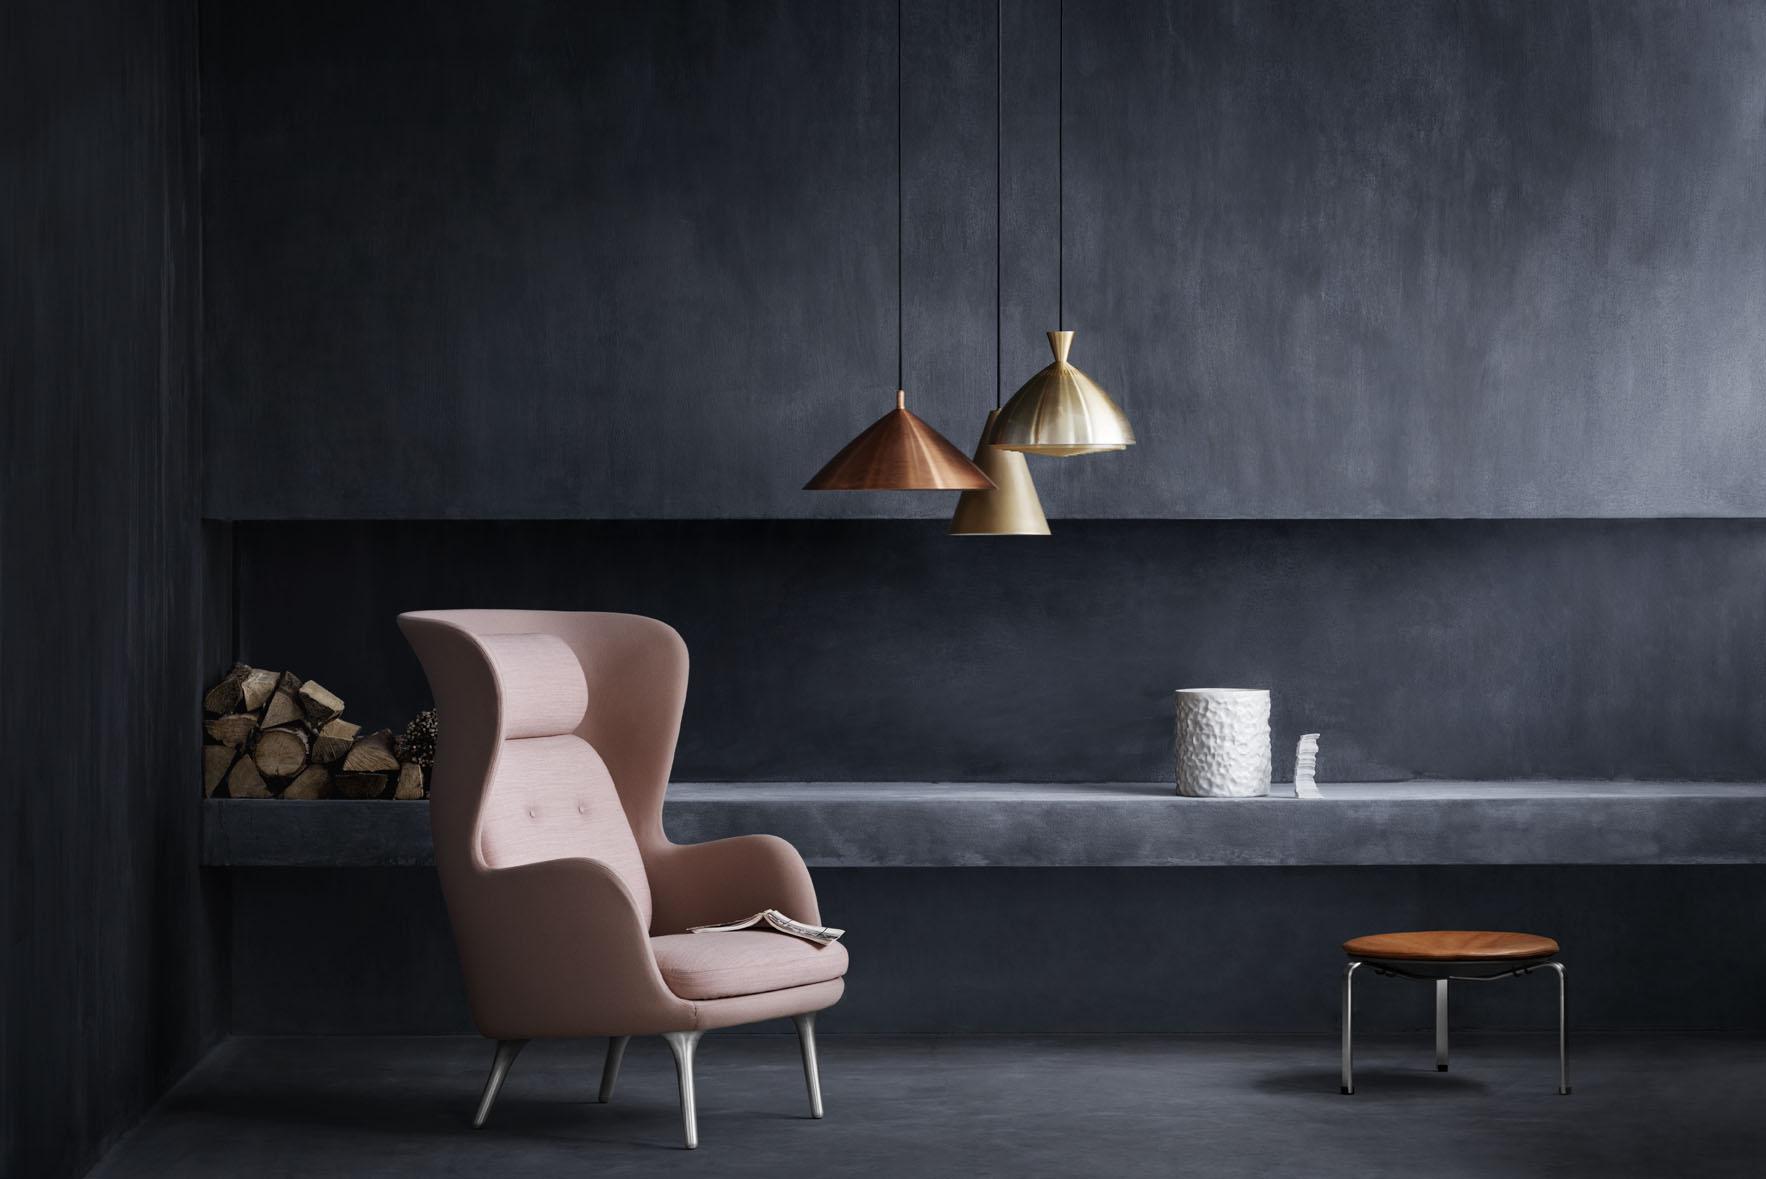 fritz hansen s ro the new comfort zone interior design. Black Bedroom Furniture Sets. Home Design Ideas